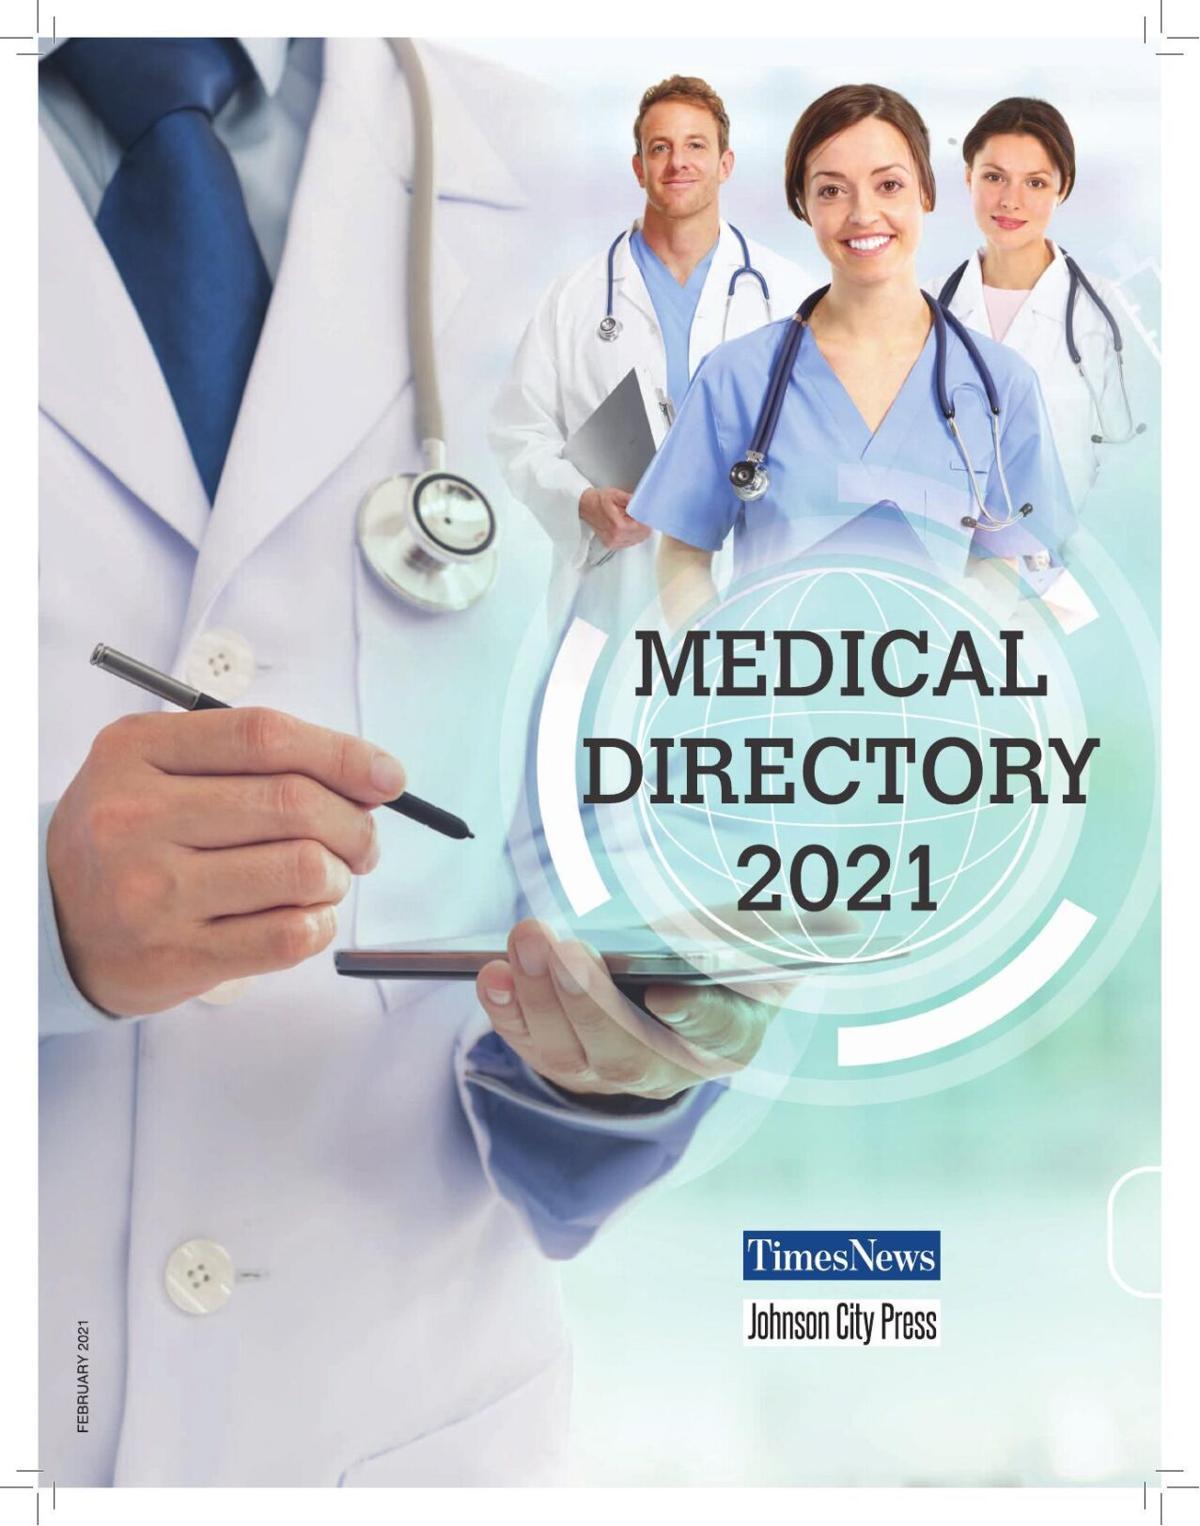 Medical Directory 2021